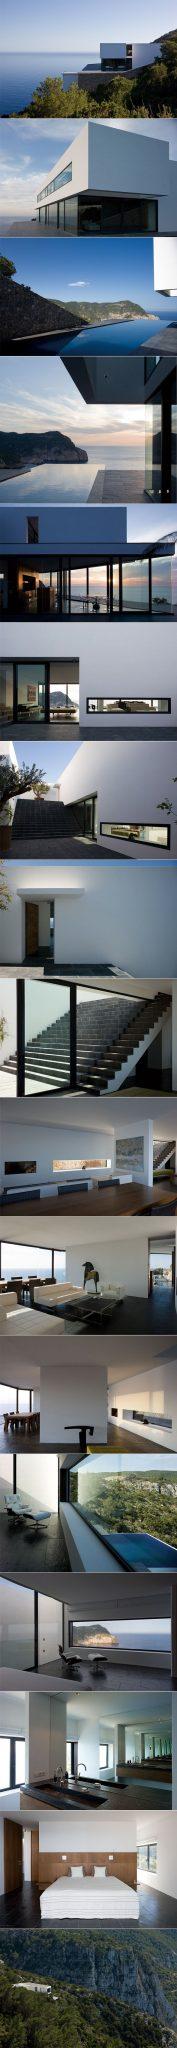 Maison-AIBS-2-tt-width-590-height-6816-crop-1-bgcolor-000000-except_gif-1